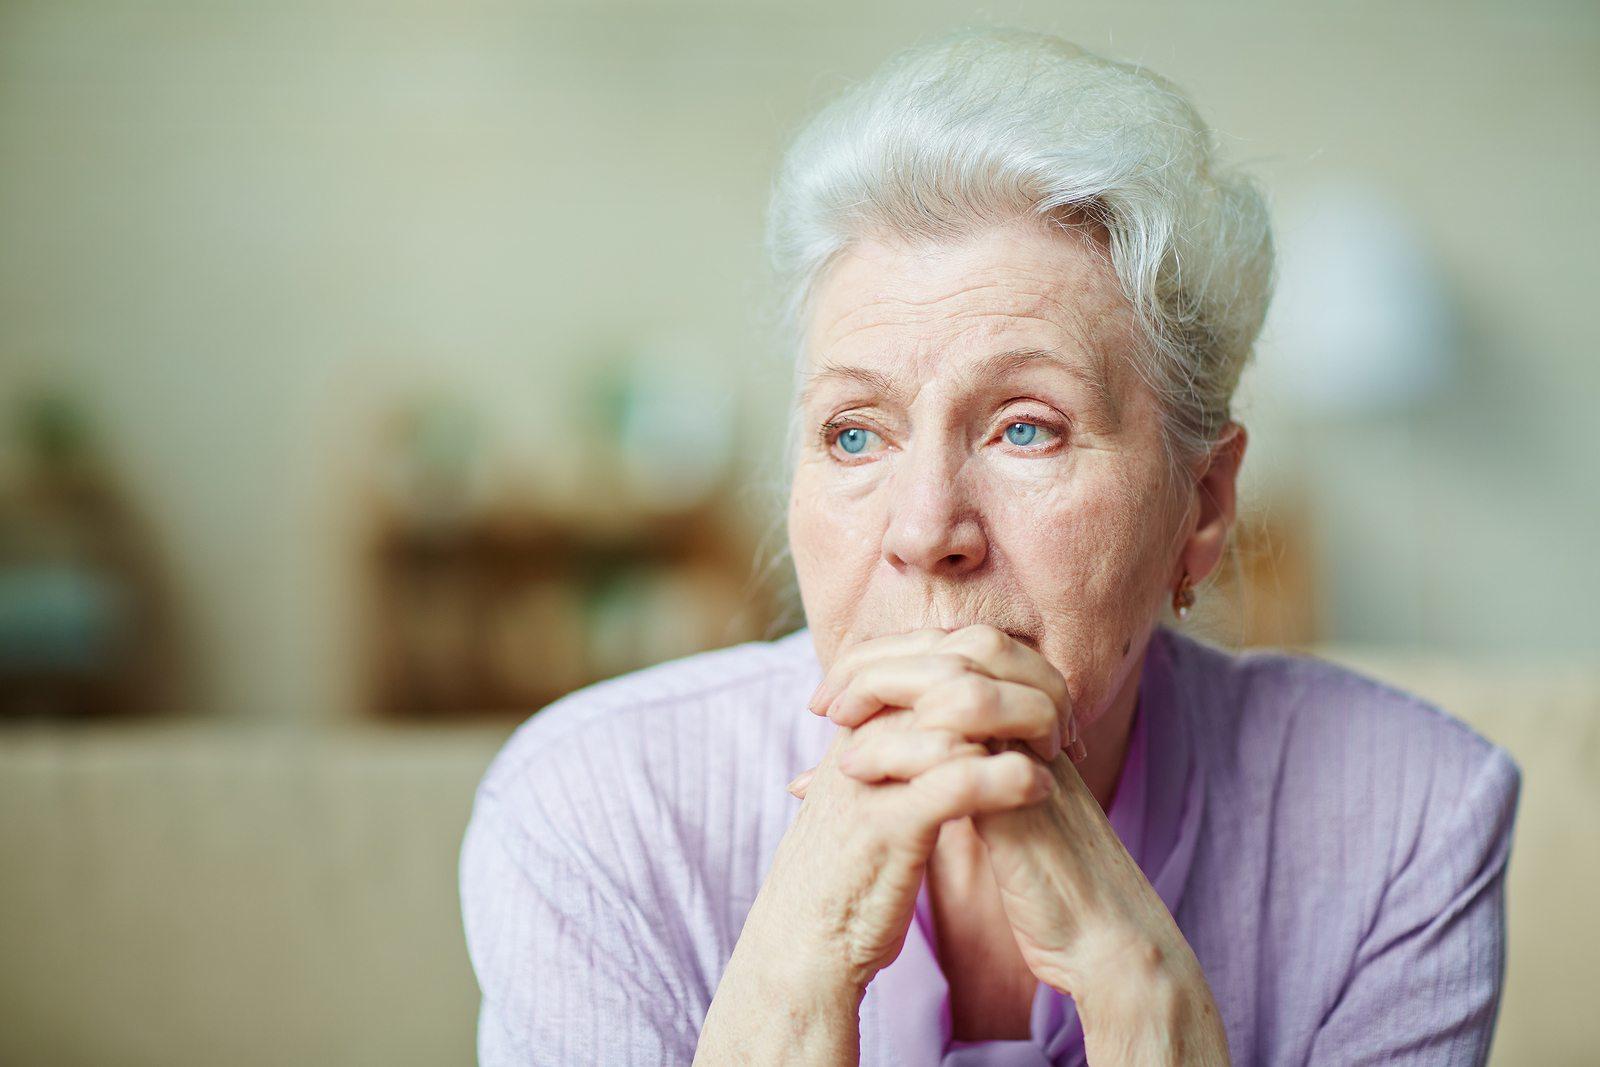 Sad senior woman sitting at home